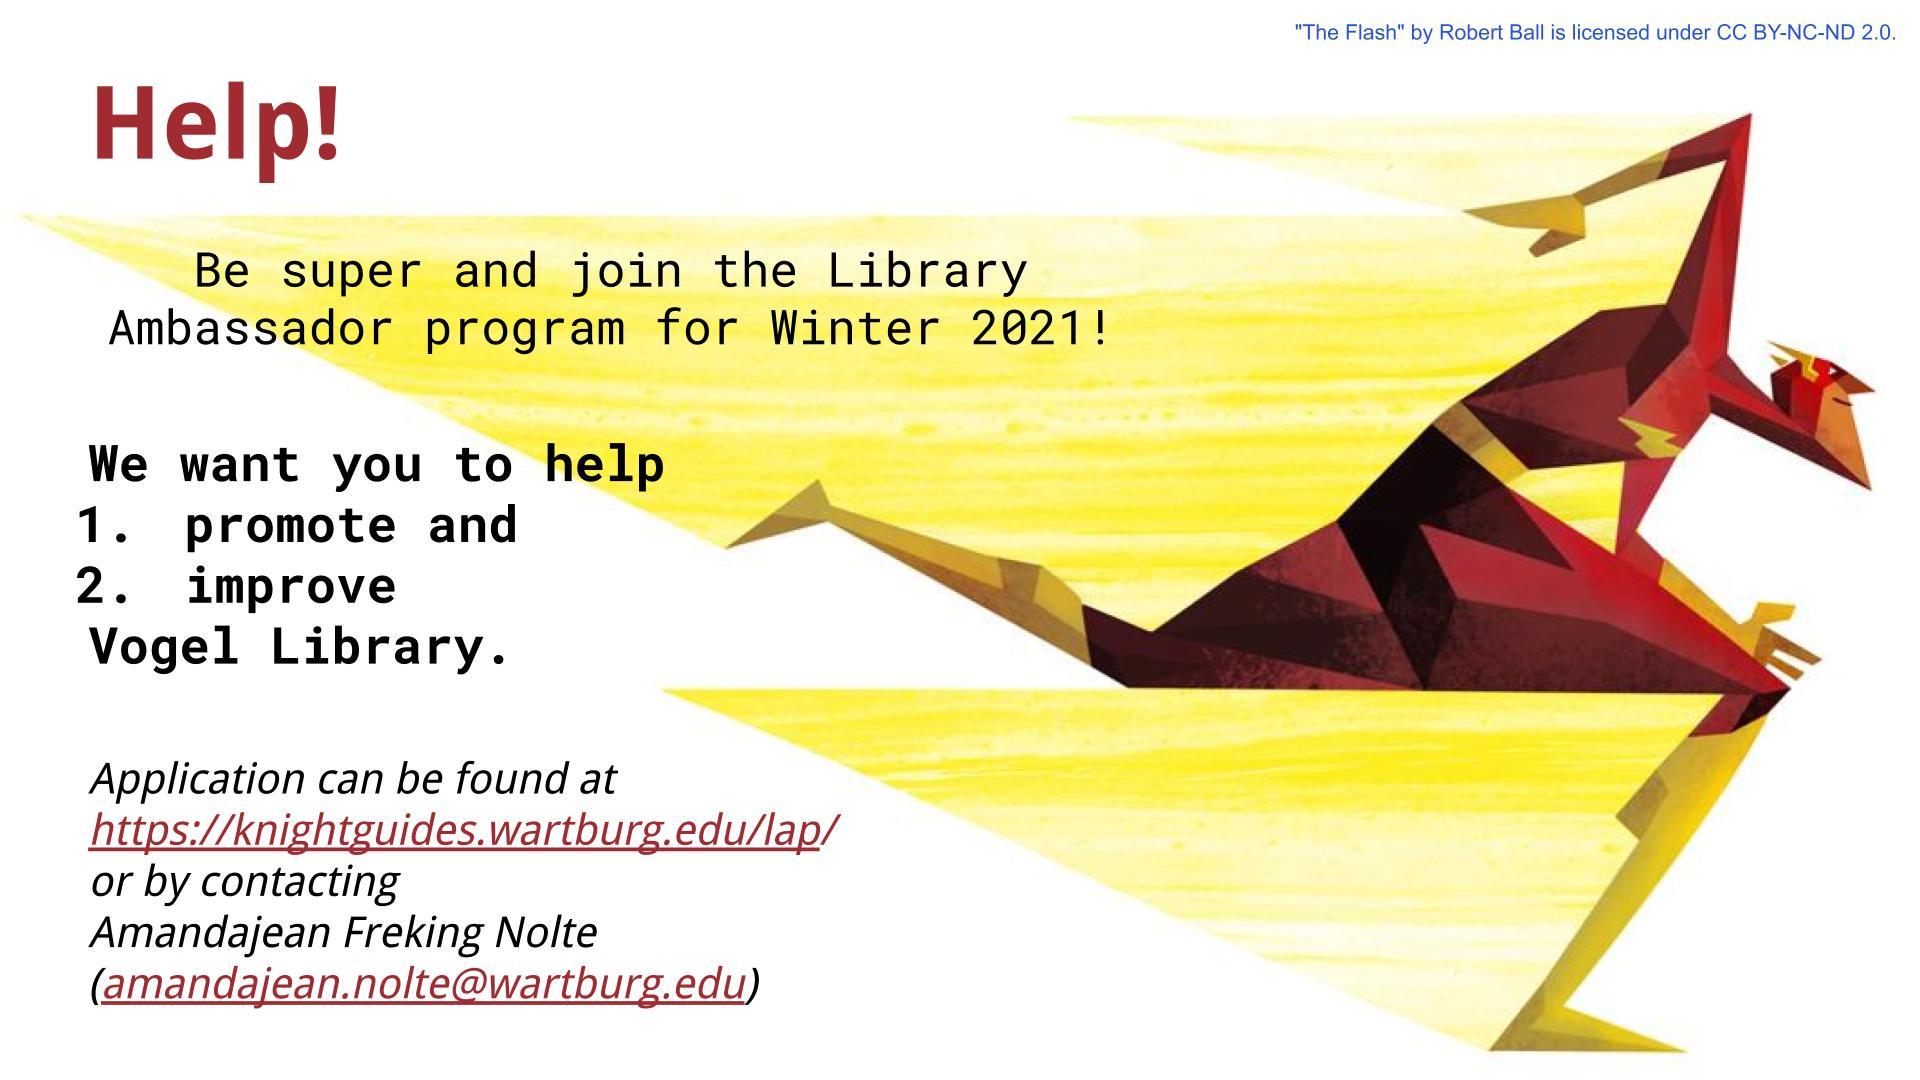 advertisement for Library Ambassador application